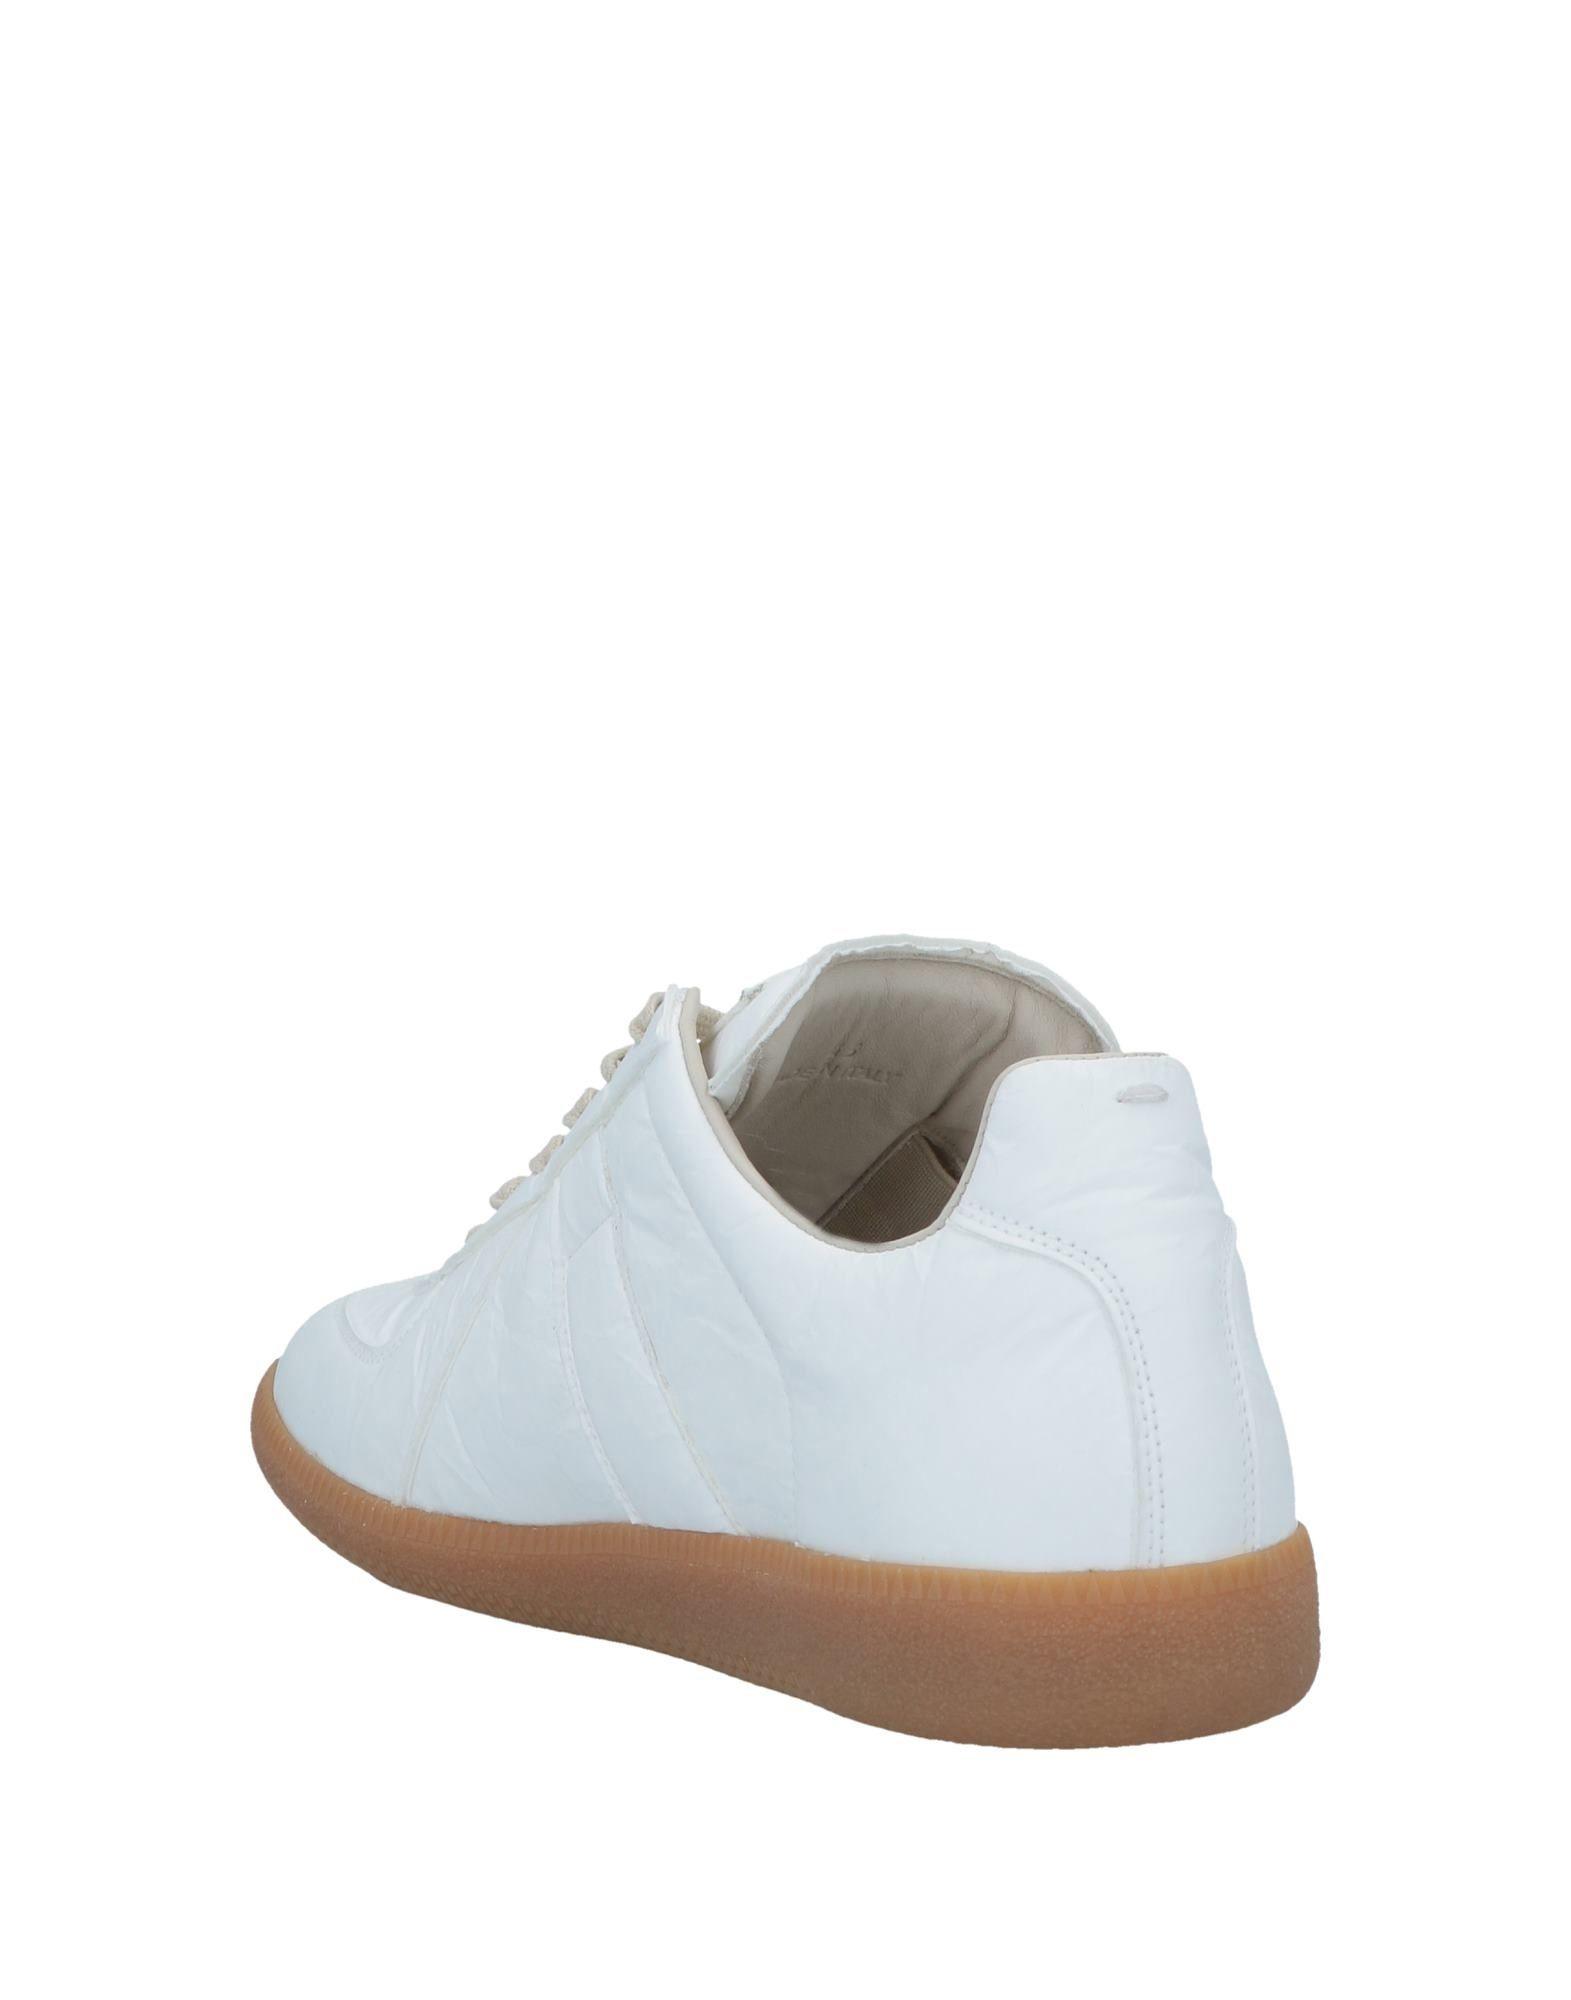 Maison Margiela Sneakers Herren  Schuhe 11472035BF Gute Qualität beliebte Schuhe  353f13